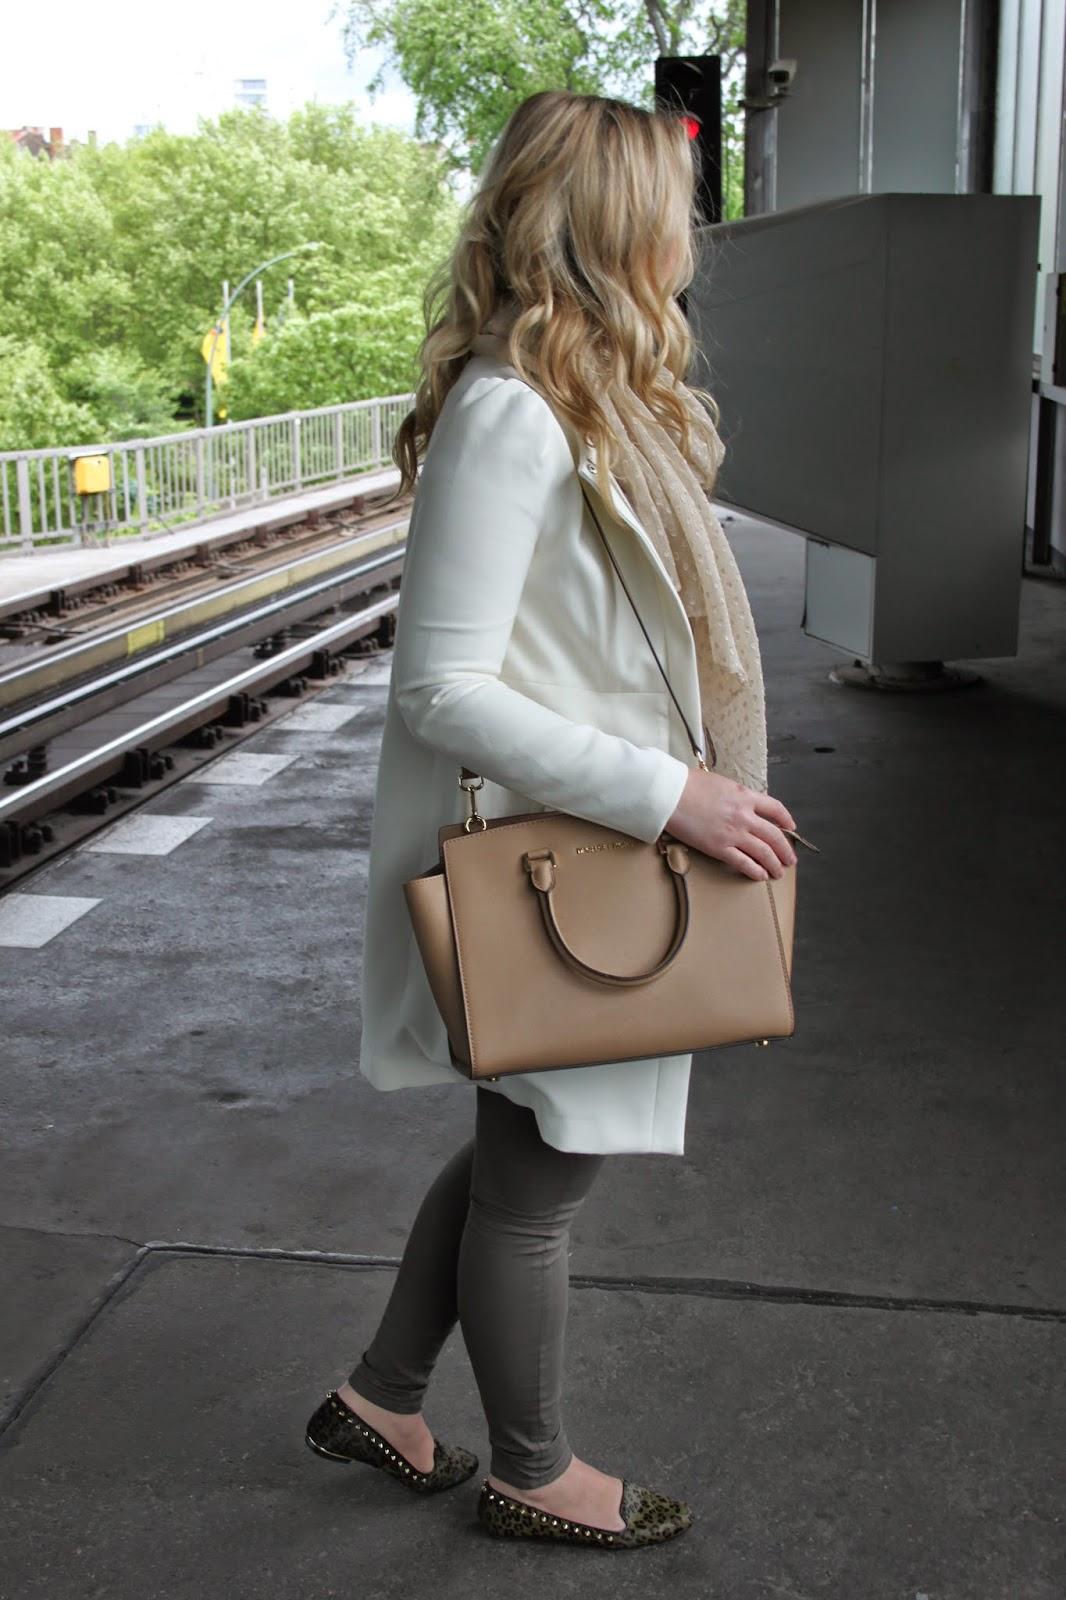 J L d a y s . . .: A white coat, loafers and a Michael Kors bag